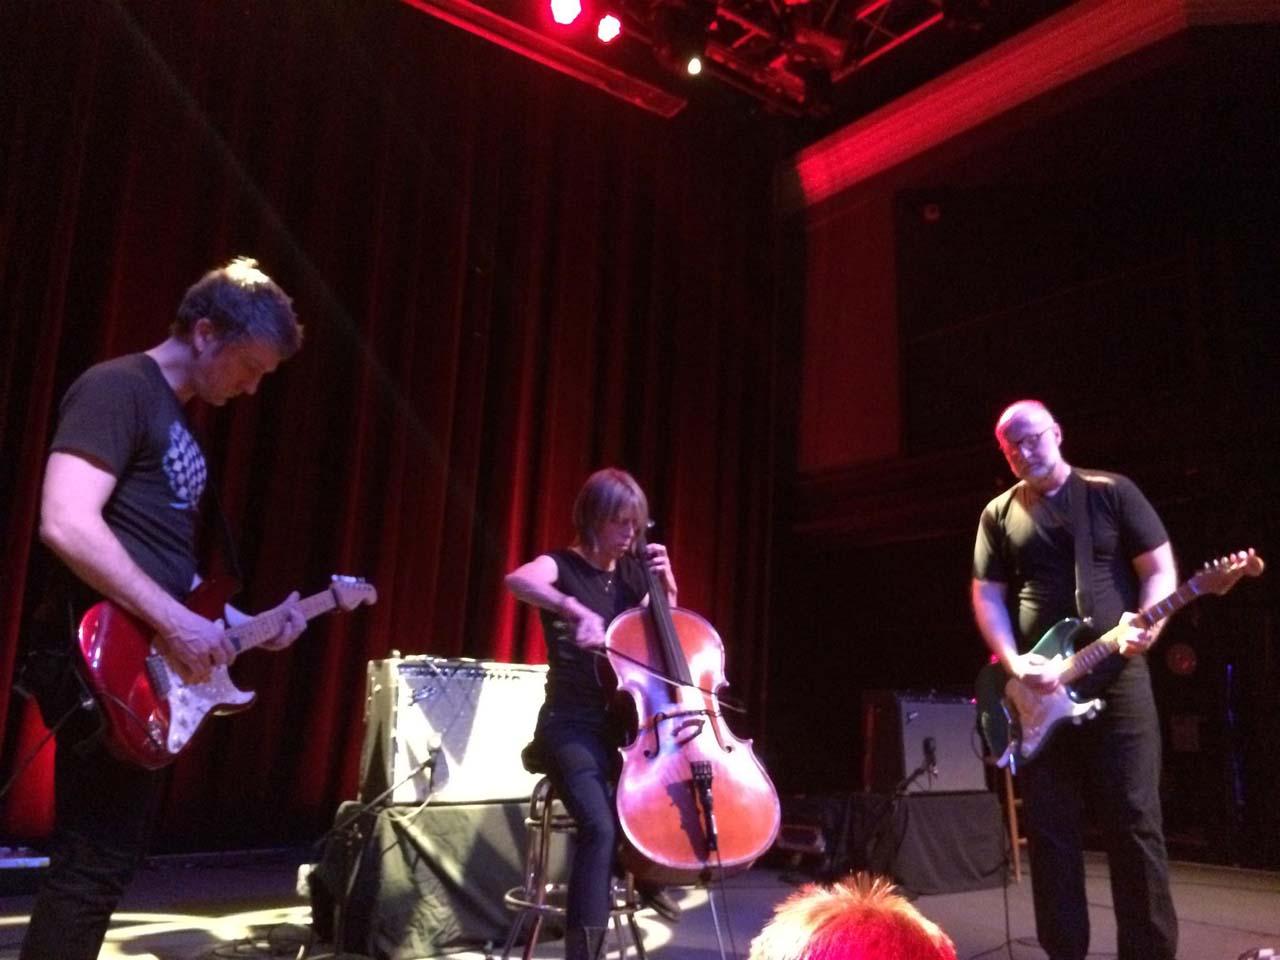 Bob Mould @ 9:30 Club, Washington DC, 05 Mar 2014